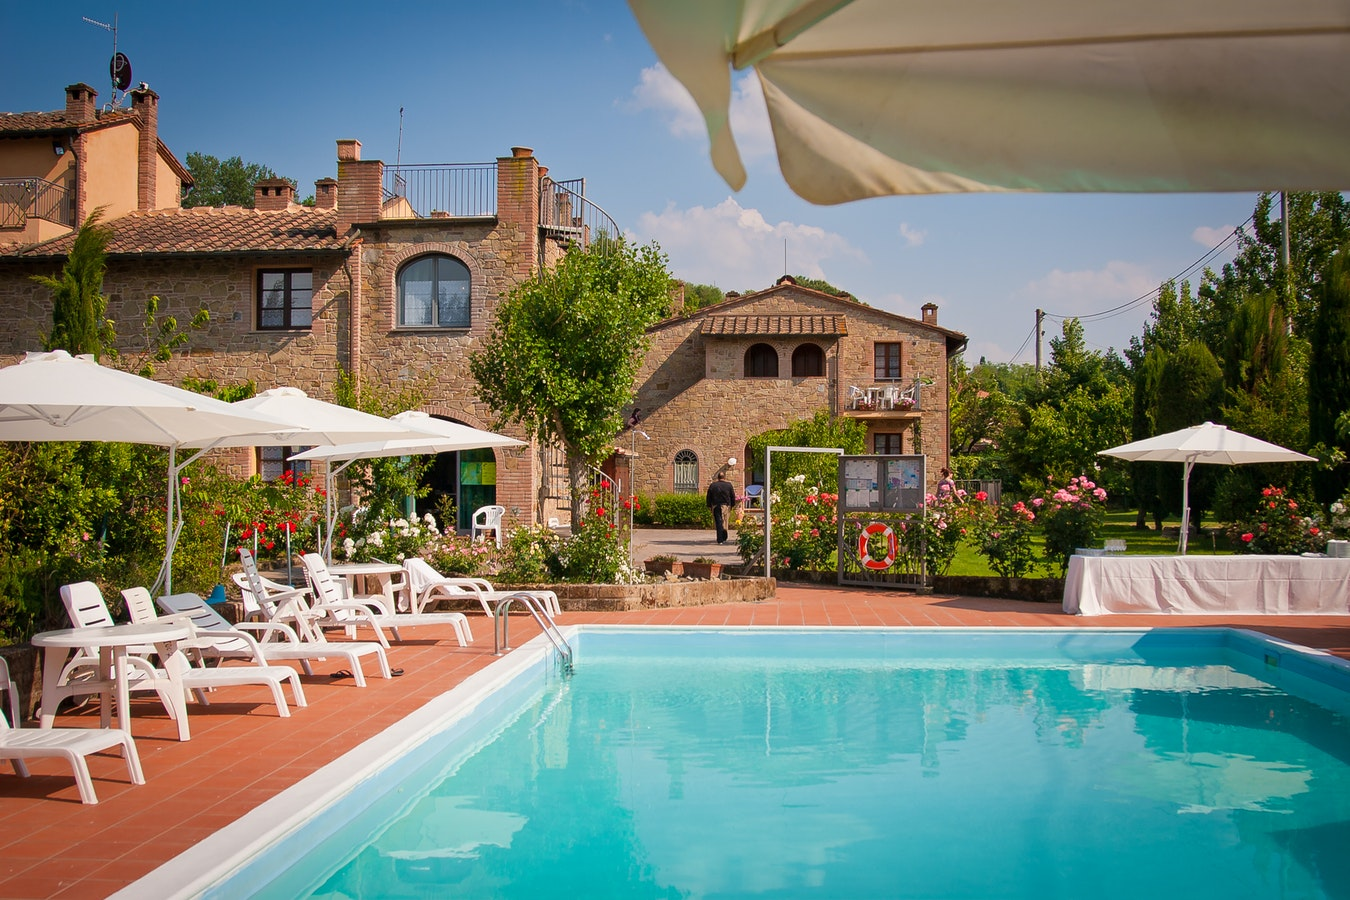 Matrimonio Civile In Agriturismo Toscana : Residence santa maria montaione agriturismo con